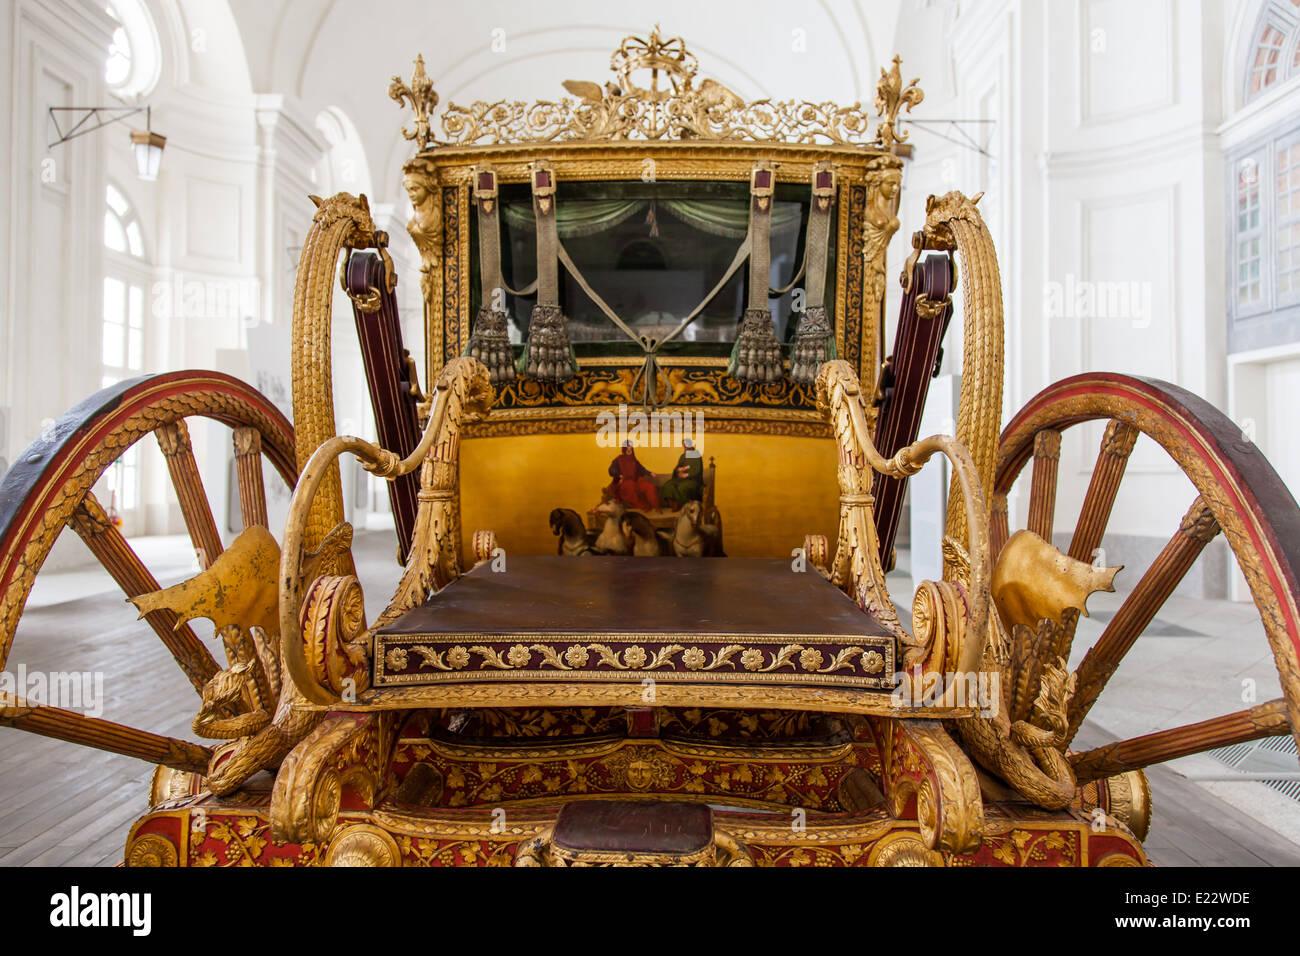 Italia. Antiguo palacio de lujo en autobús de fondo. Imagen De Stock